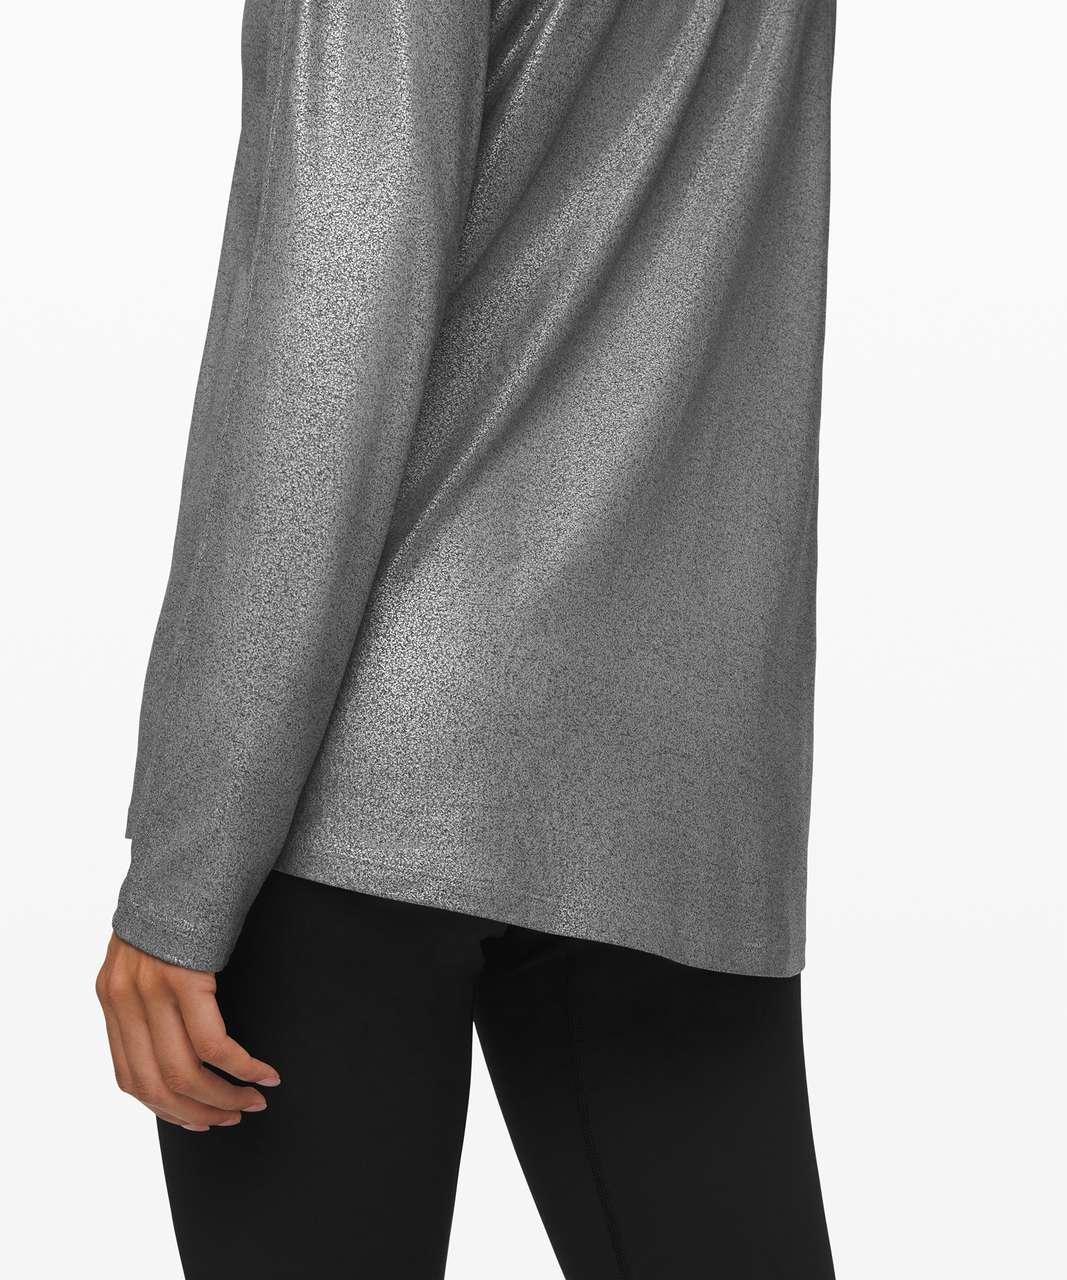 Lululemon Emerald Long Sleeve *Foil - Luminosity Foil Print Heathered Metal Grey Silver Foil